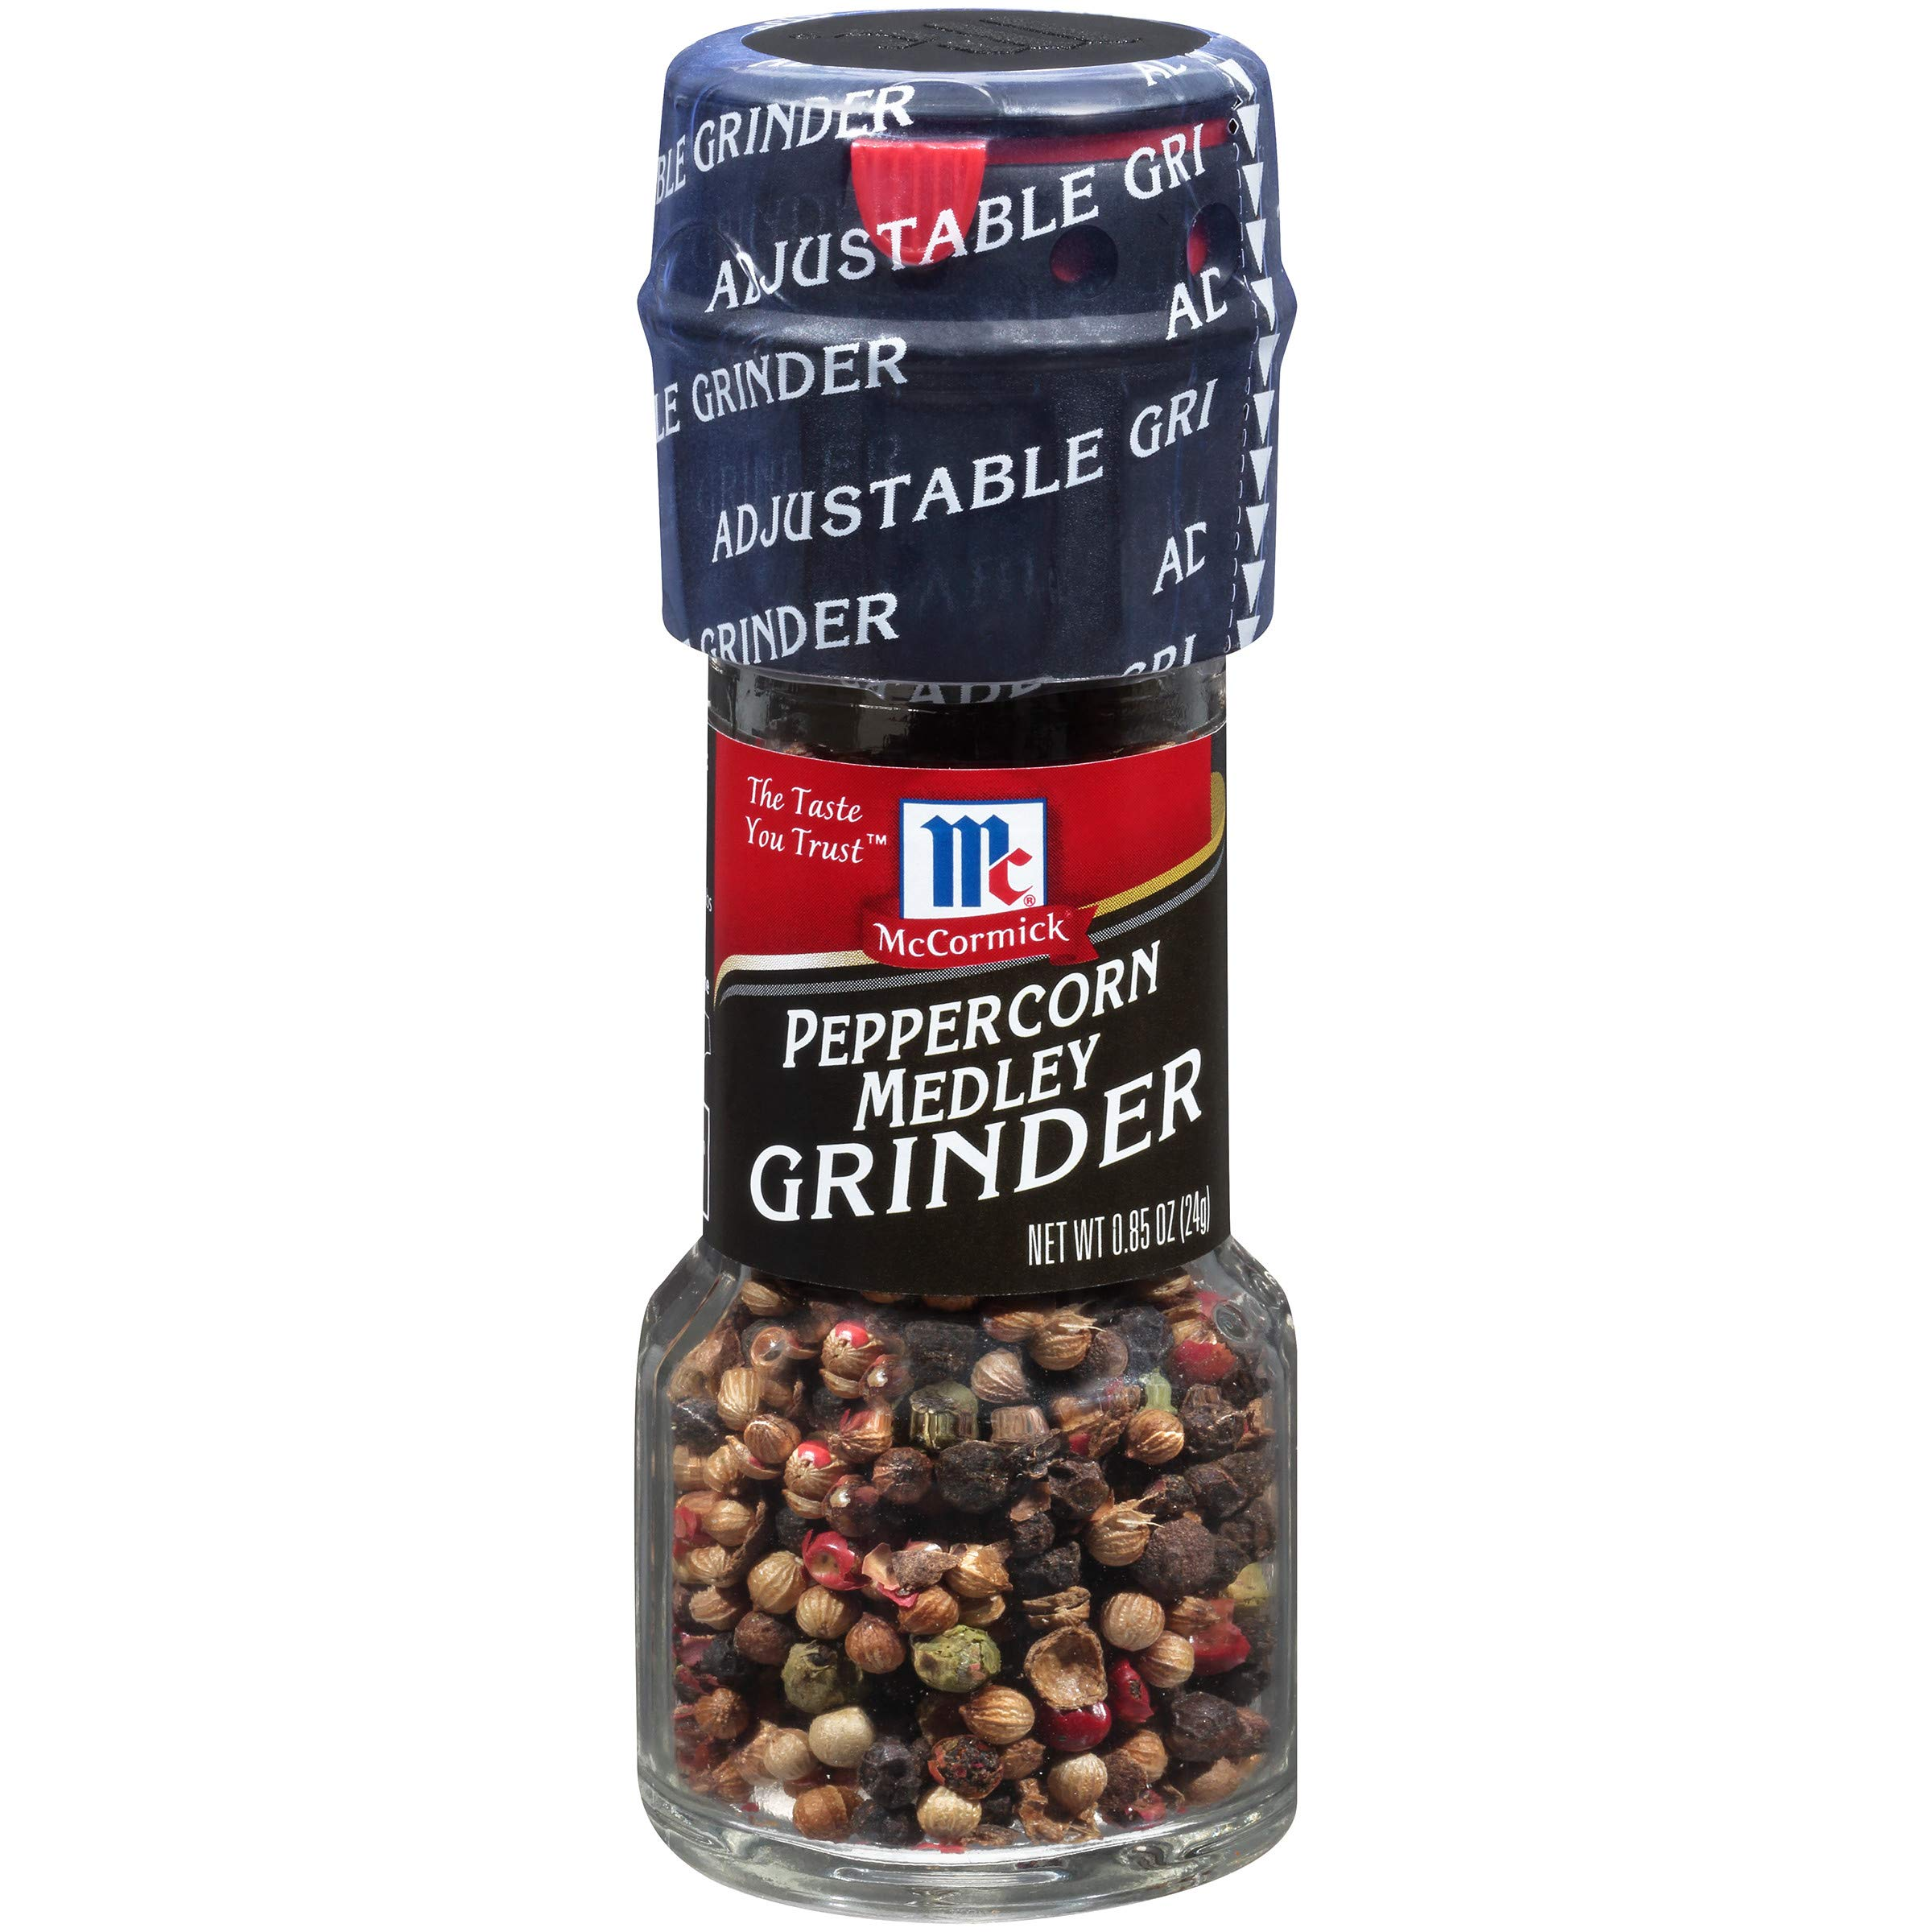 McCormick Peppercorn Medley Grinder, 0.85 oz, Pack of 6